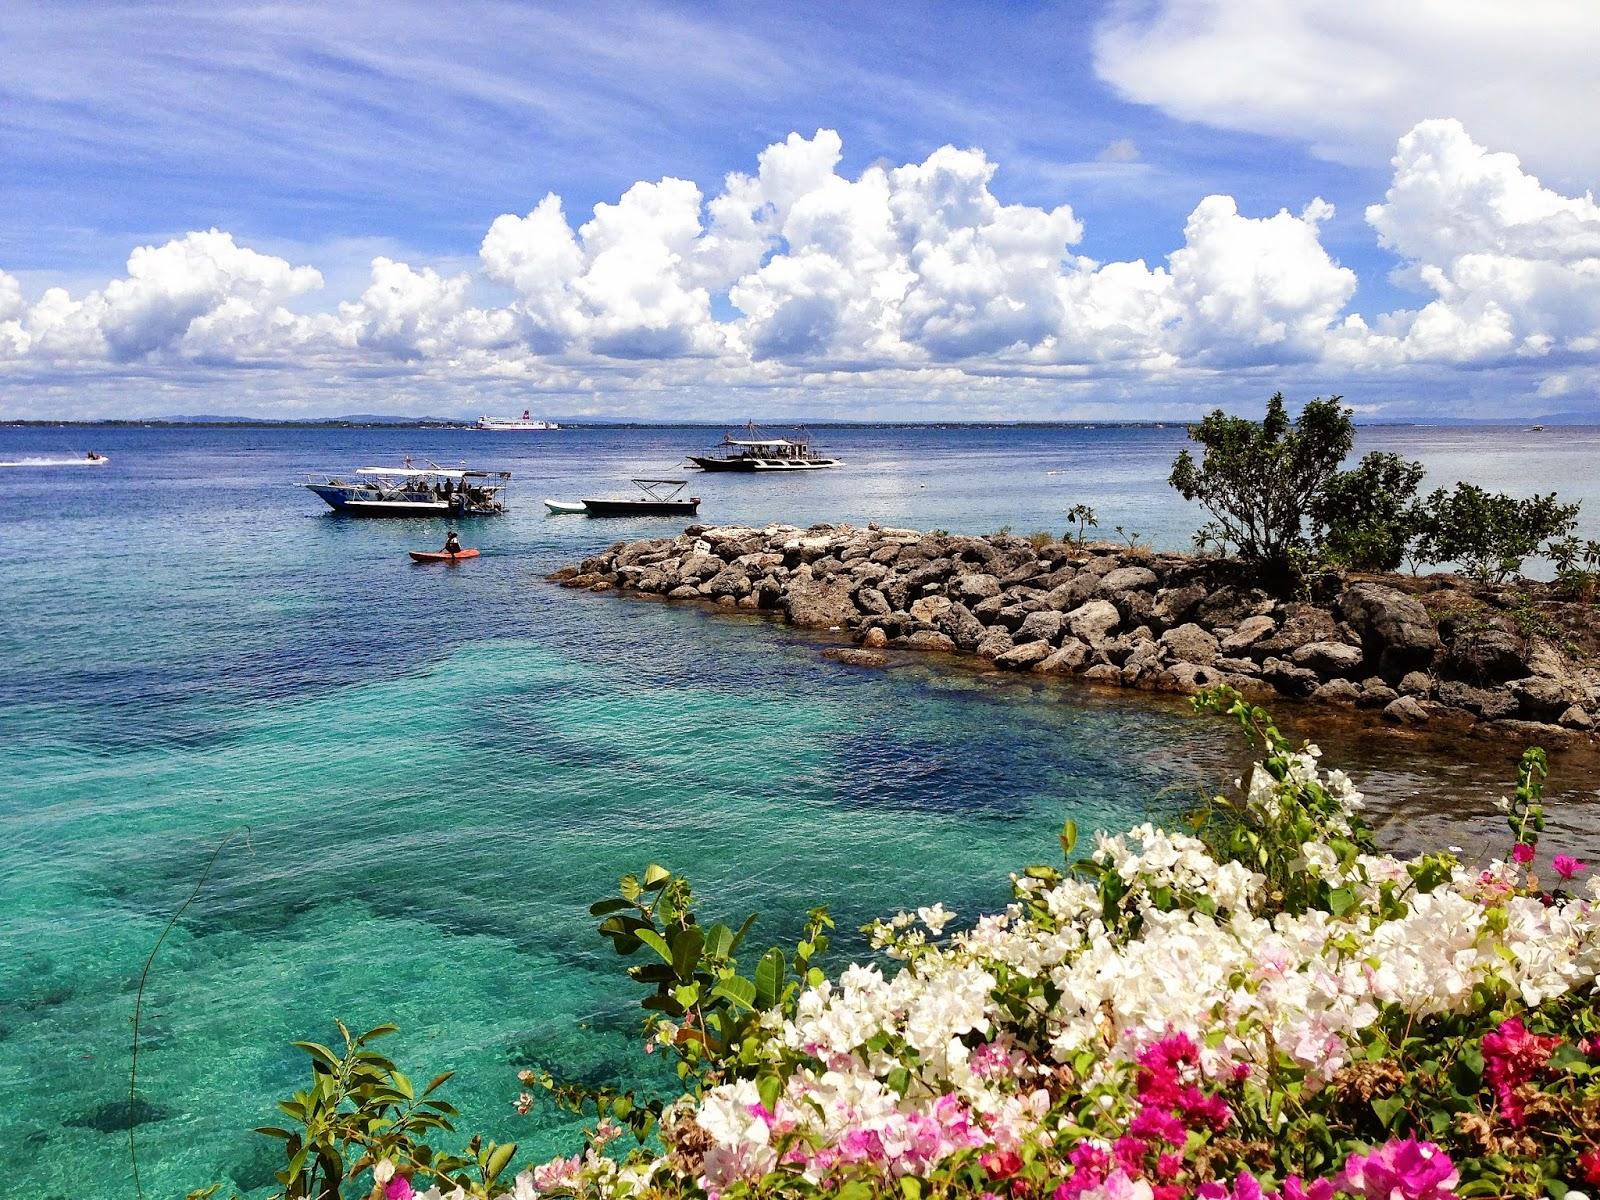 Mactan, Cebu, Philippines